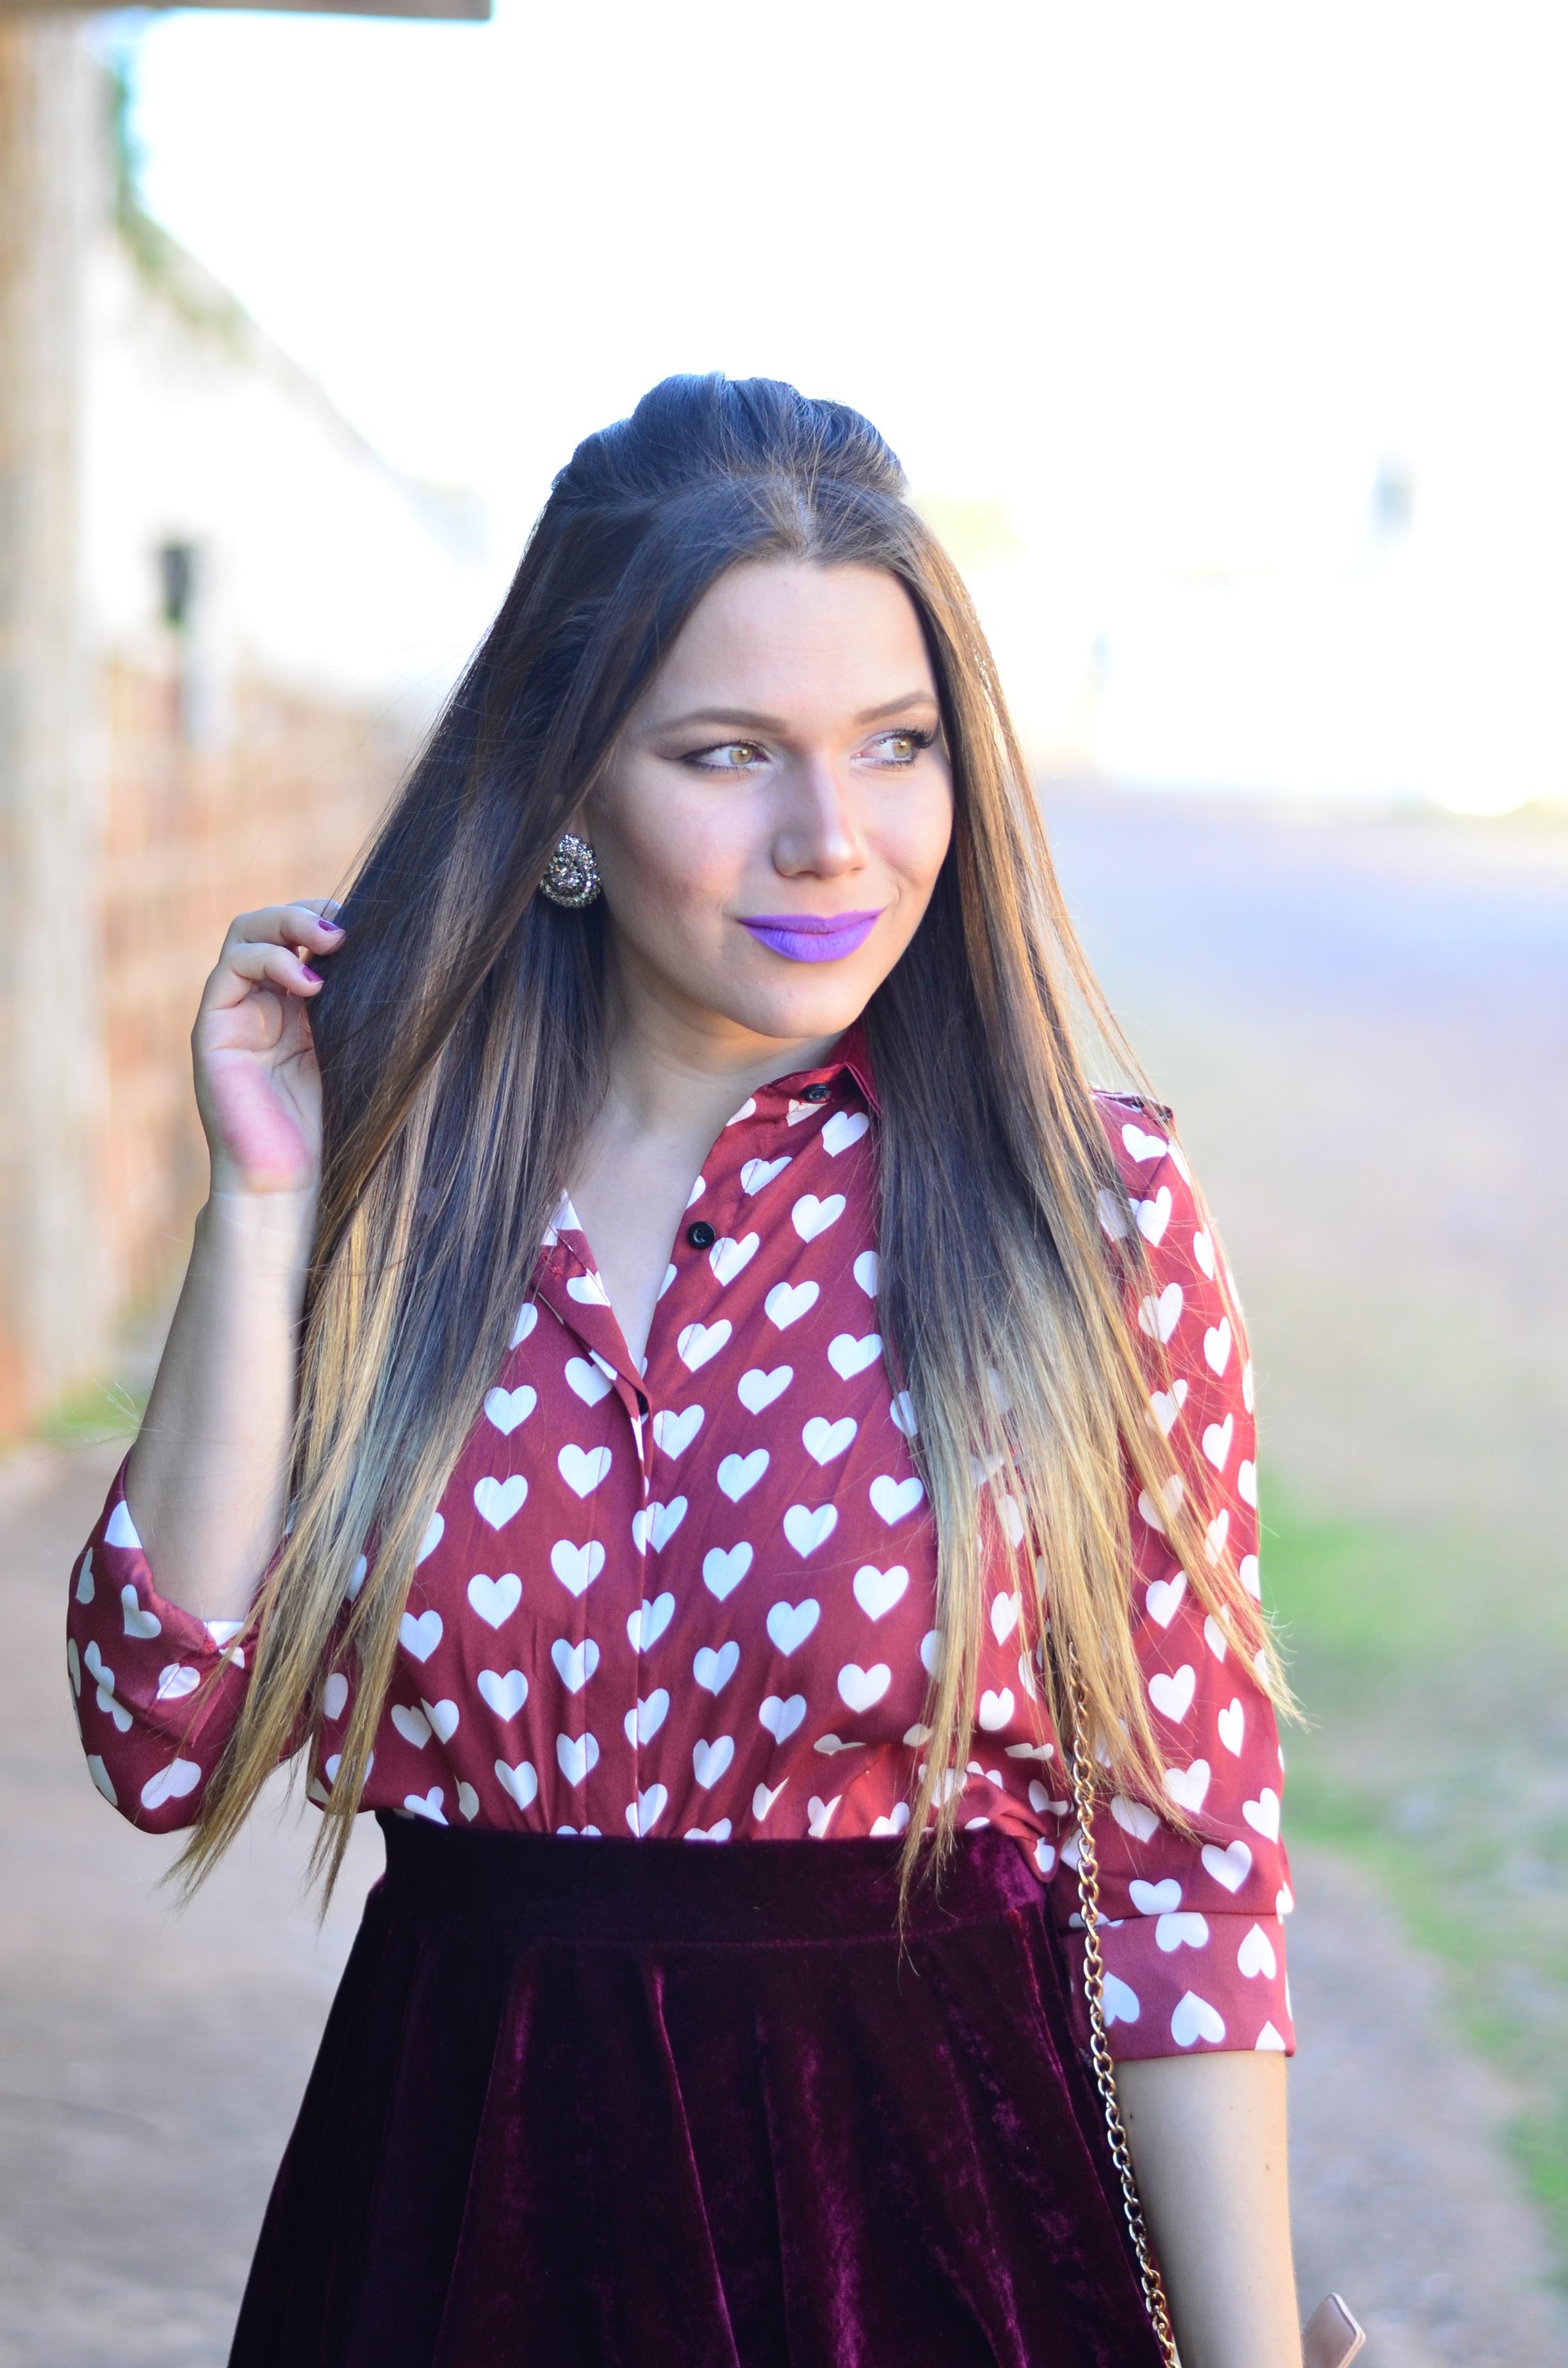 look-romantico-camisa-coracoes-e-rasteira-dourada16